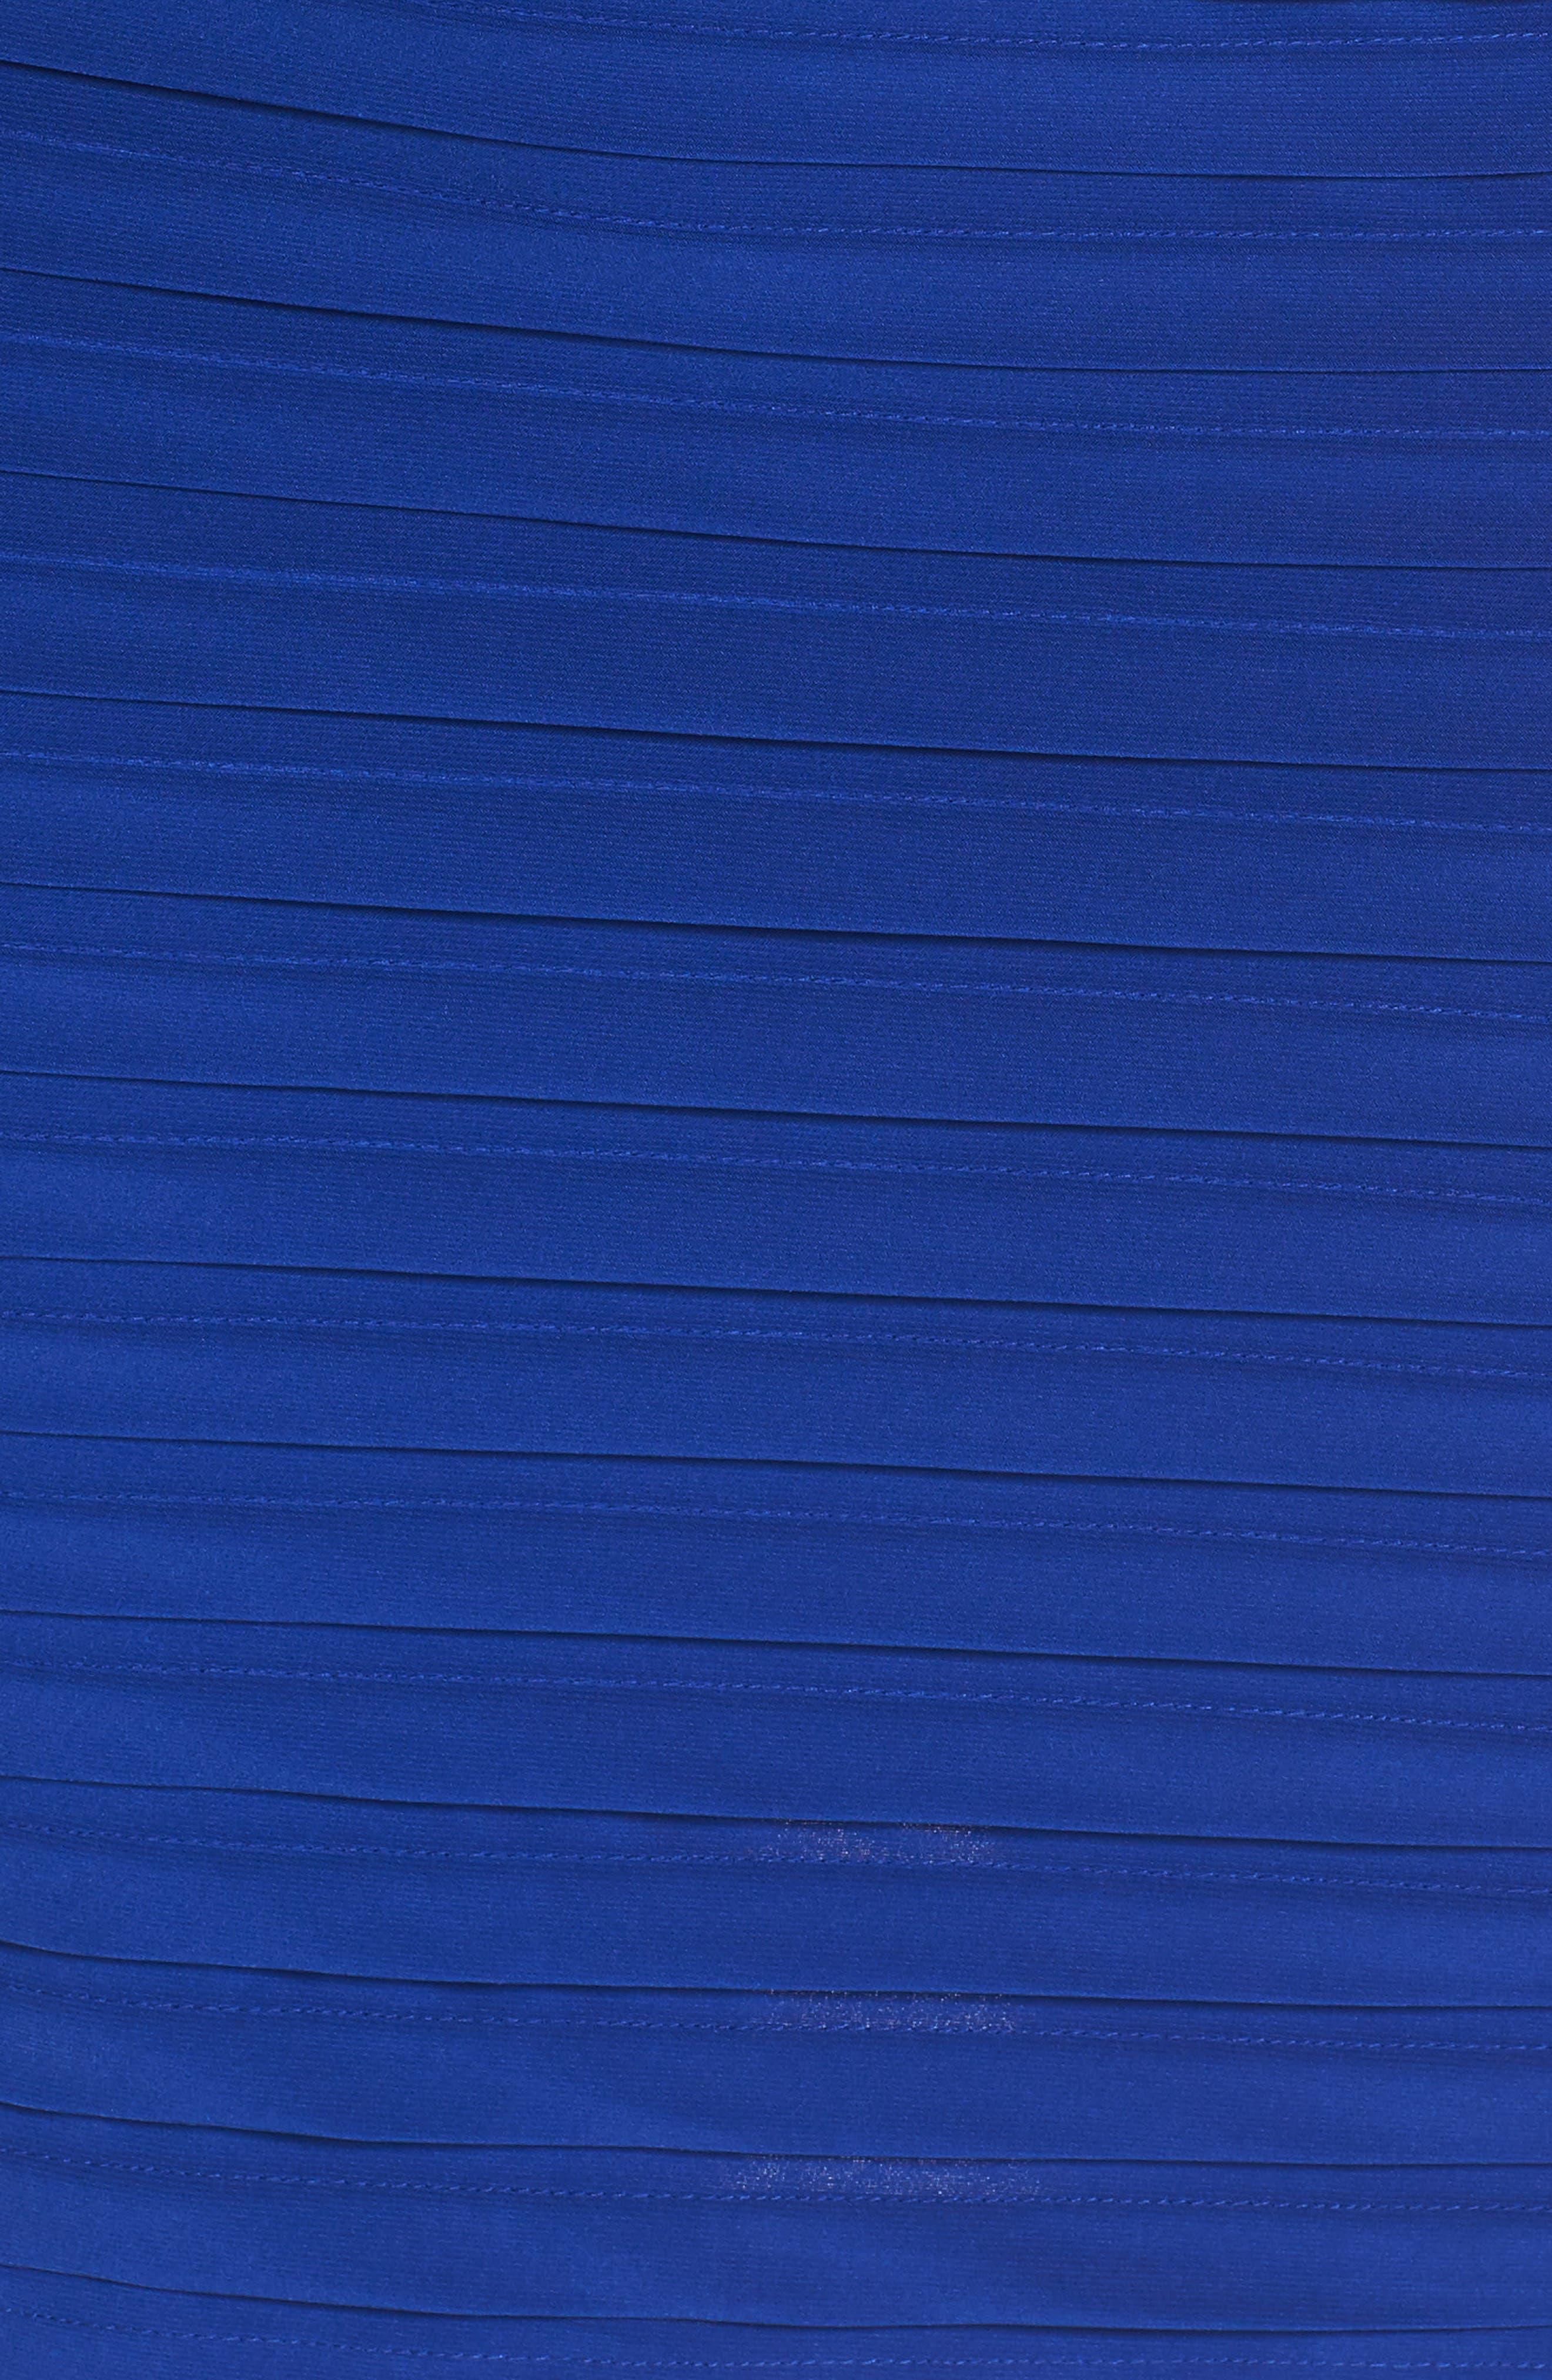 Shutter Pleat Popover Sheath Dress,                             Alternate thumbnail 6, color,                             SAPPHIRE